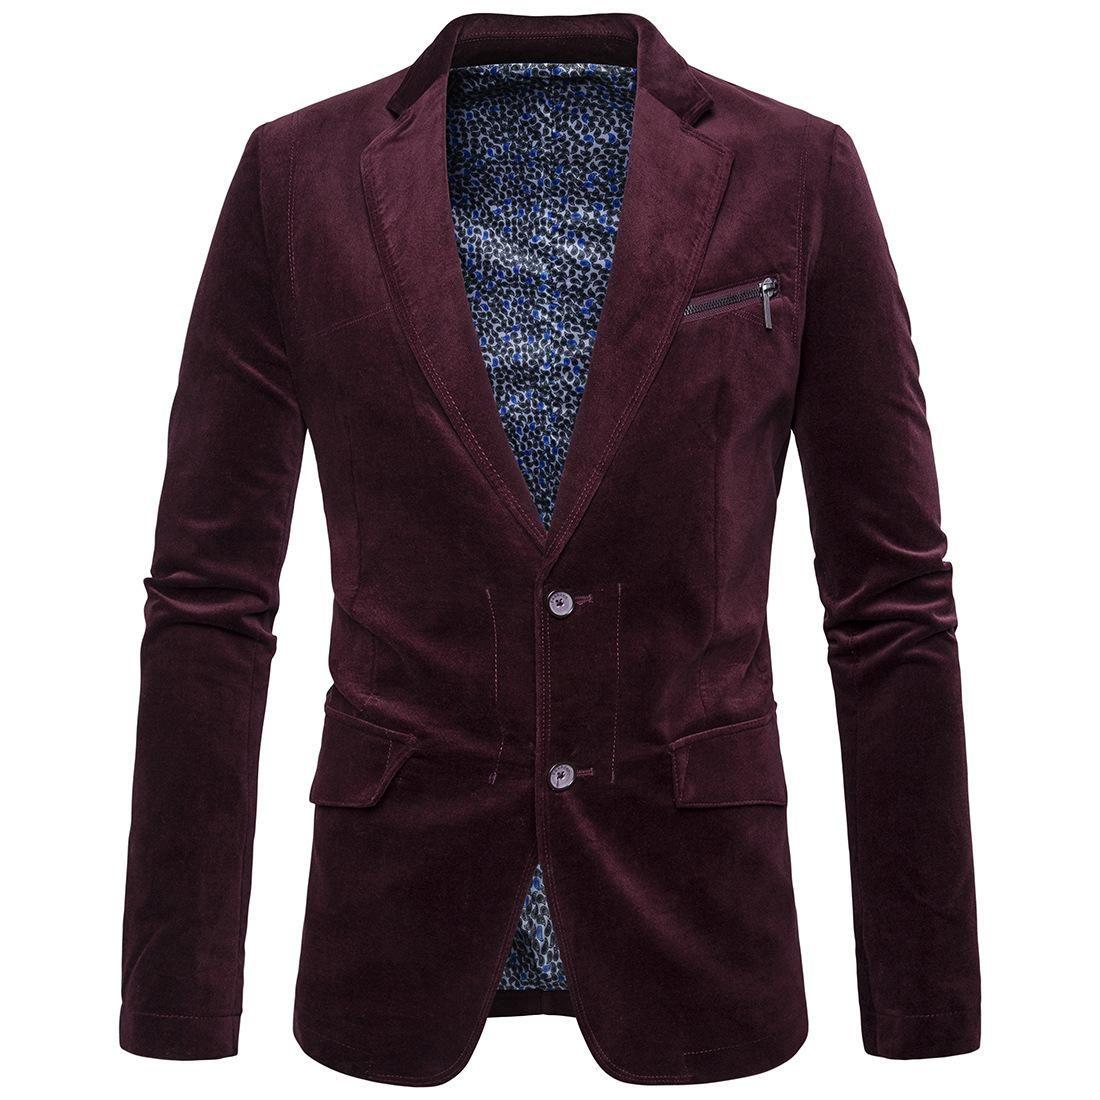 c12556b52100 2019 Plus Size Winter Warm Men Slim Blazer High Quality Corduroy Casual  Wild Blazers For Male Long Sleeve Solid Shiny Suit Men Blazer T170704 From  Supperyan ...